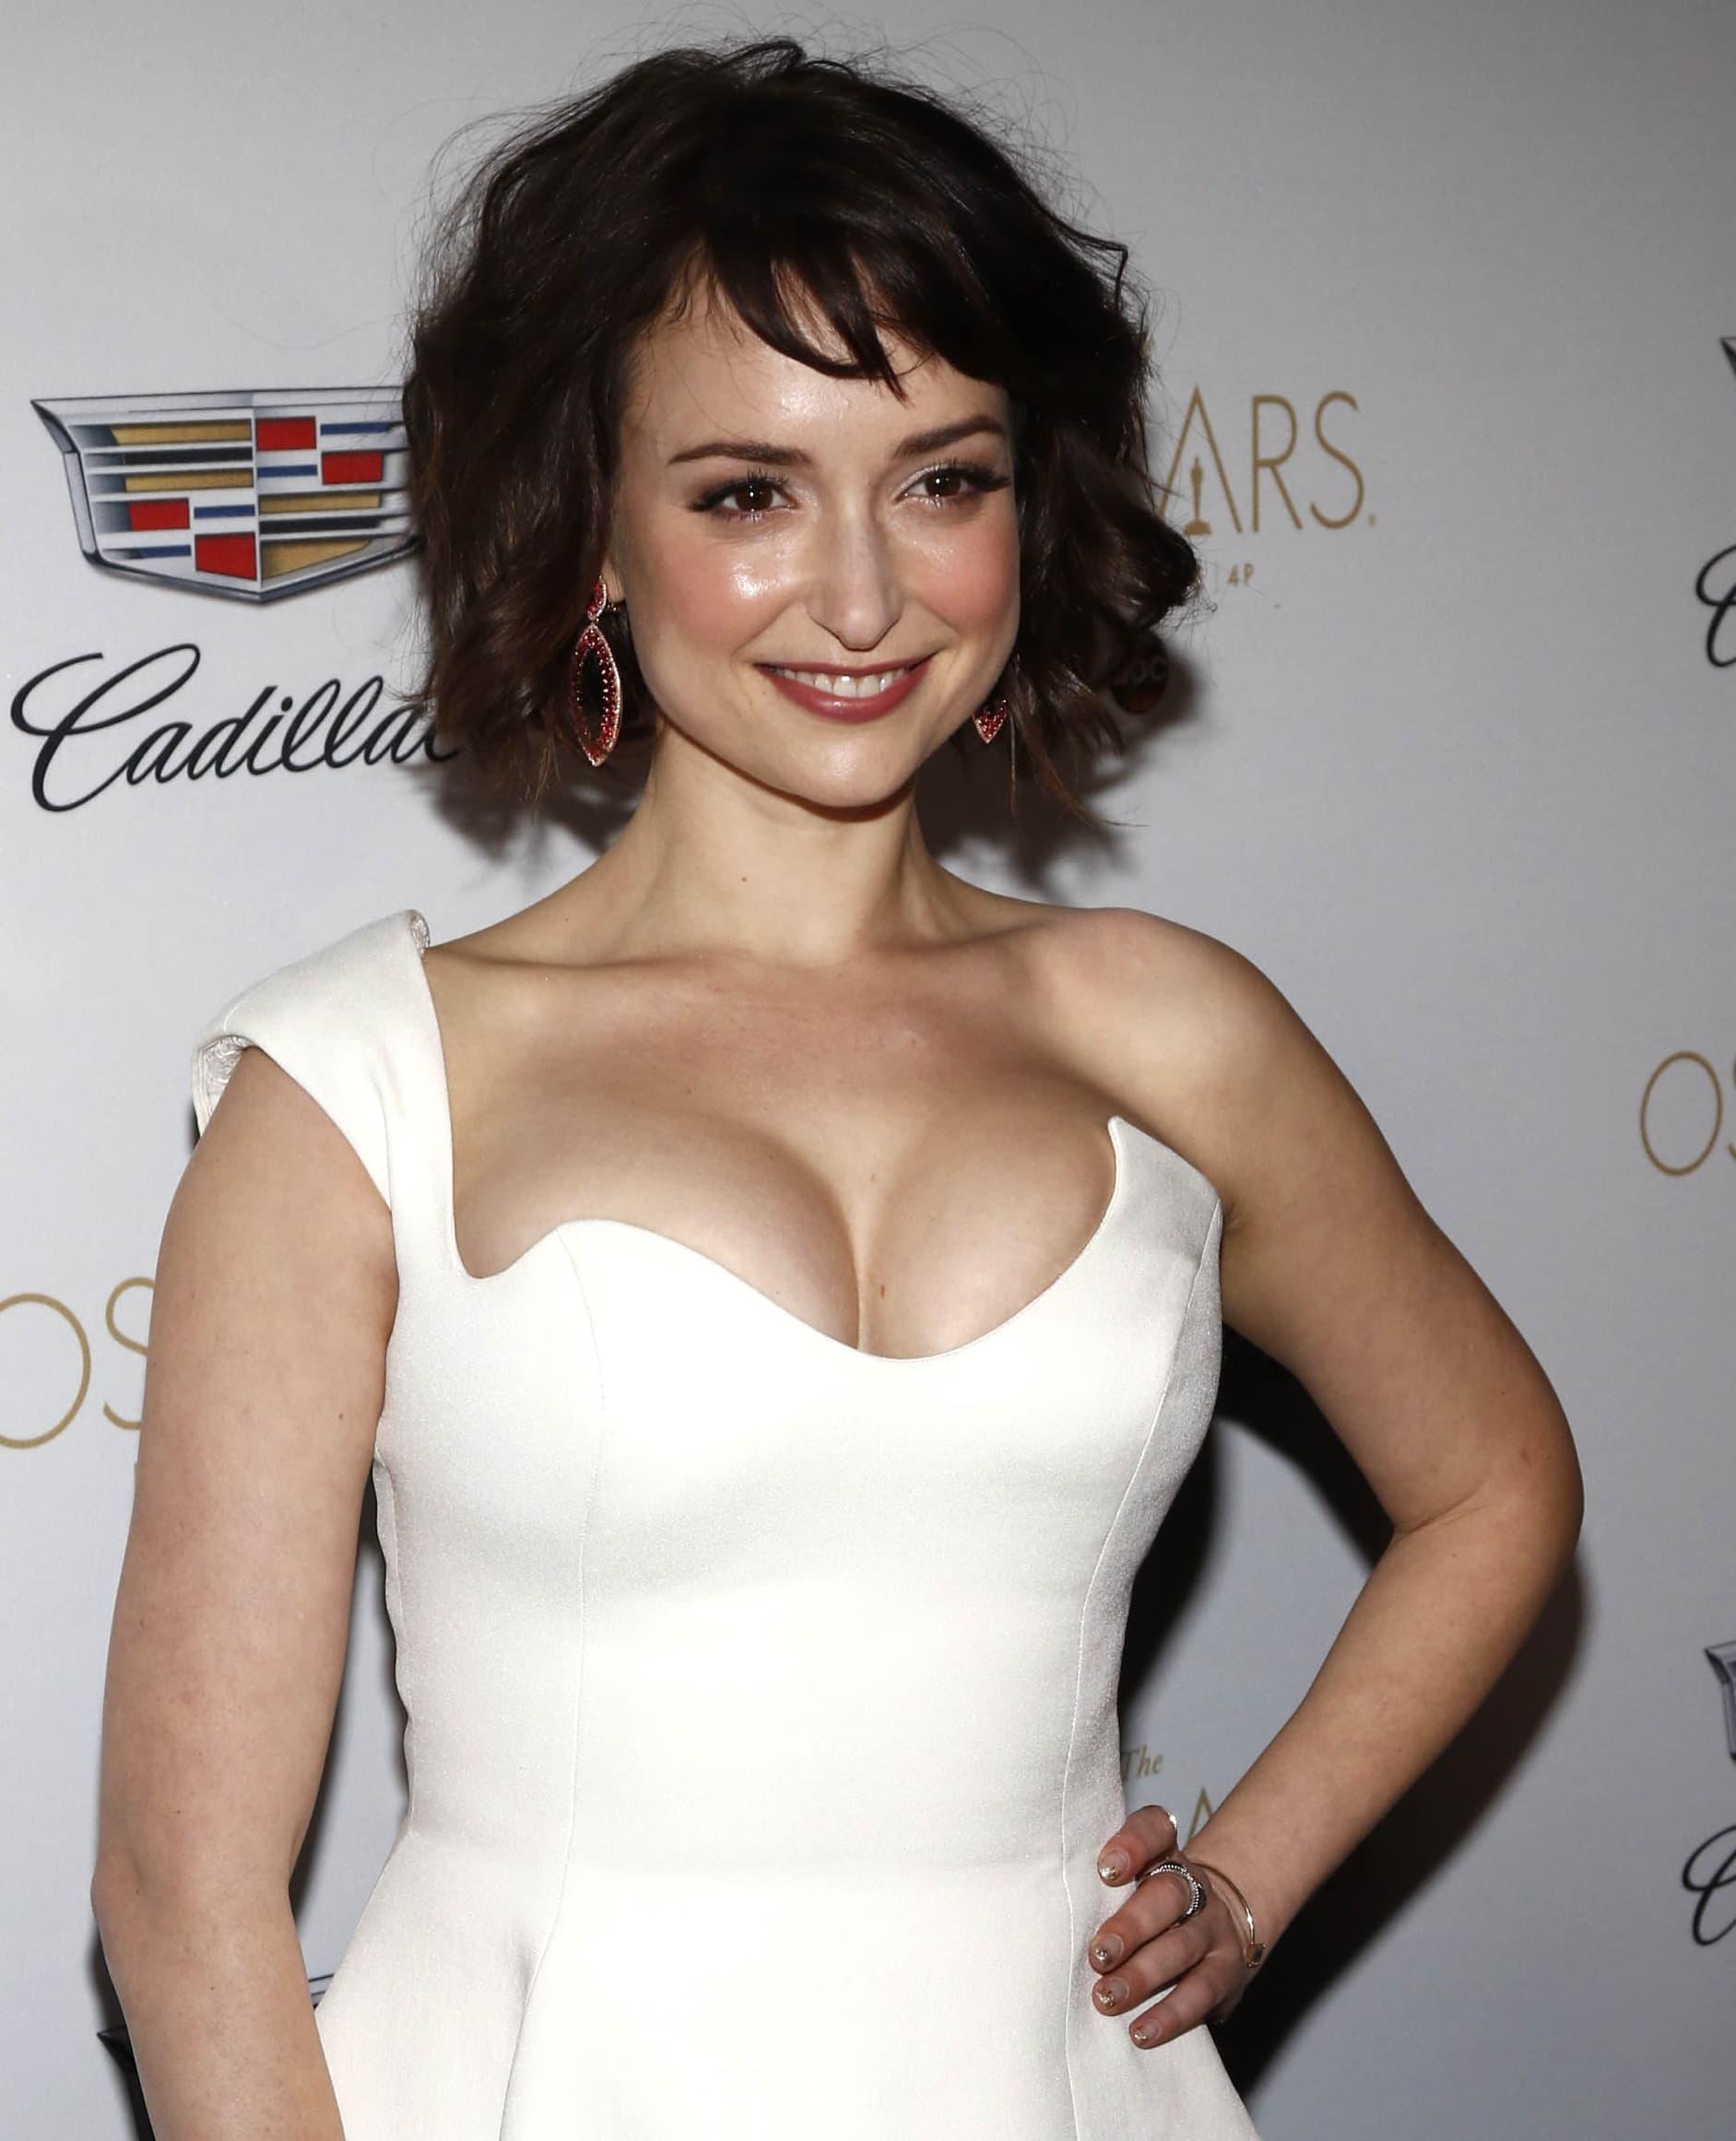 Uzbekistan-born American actress Milana Vayntrub wears bra size 32C and her breast size is 35